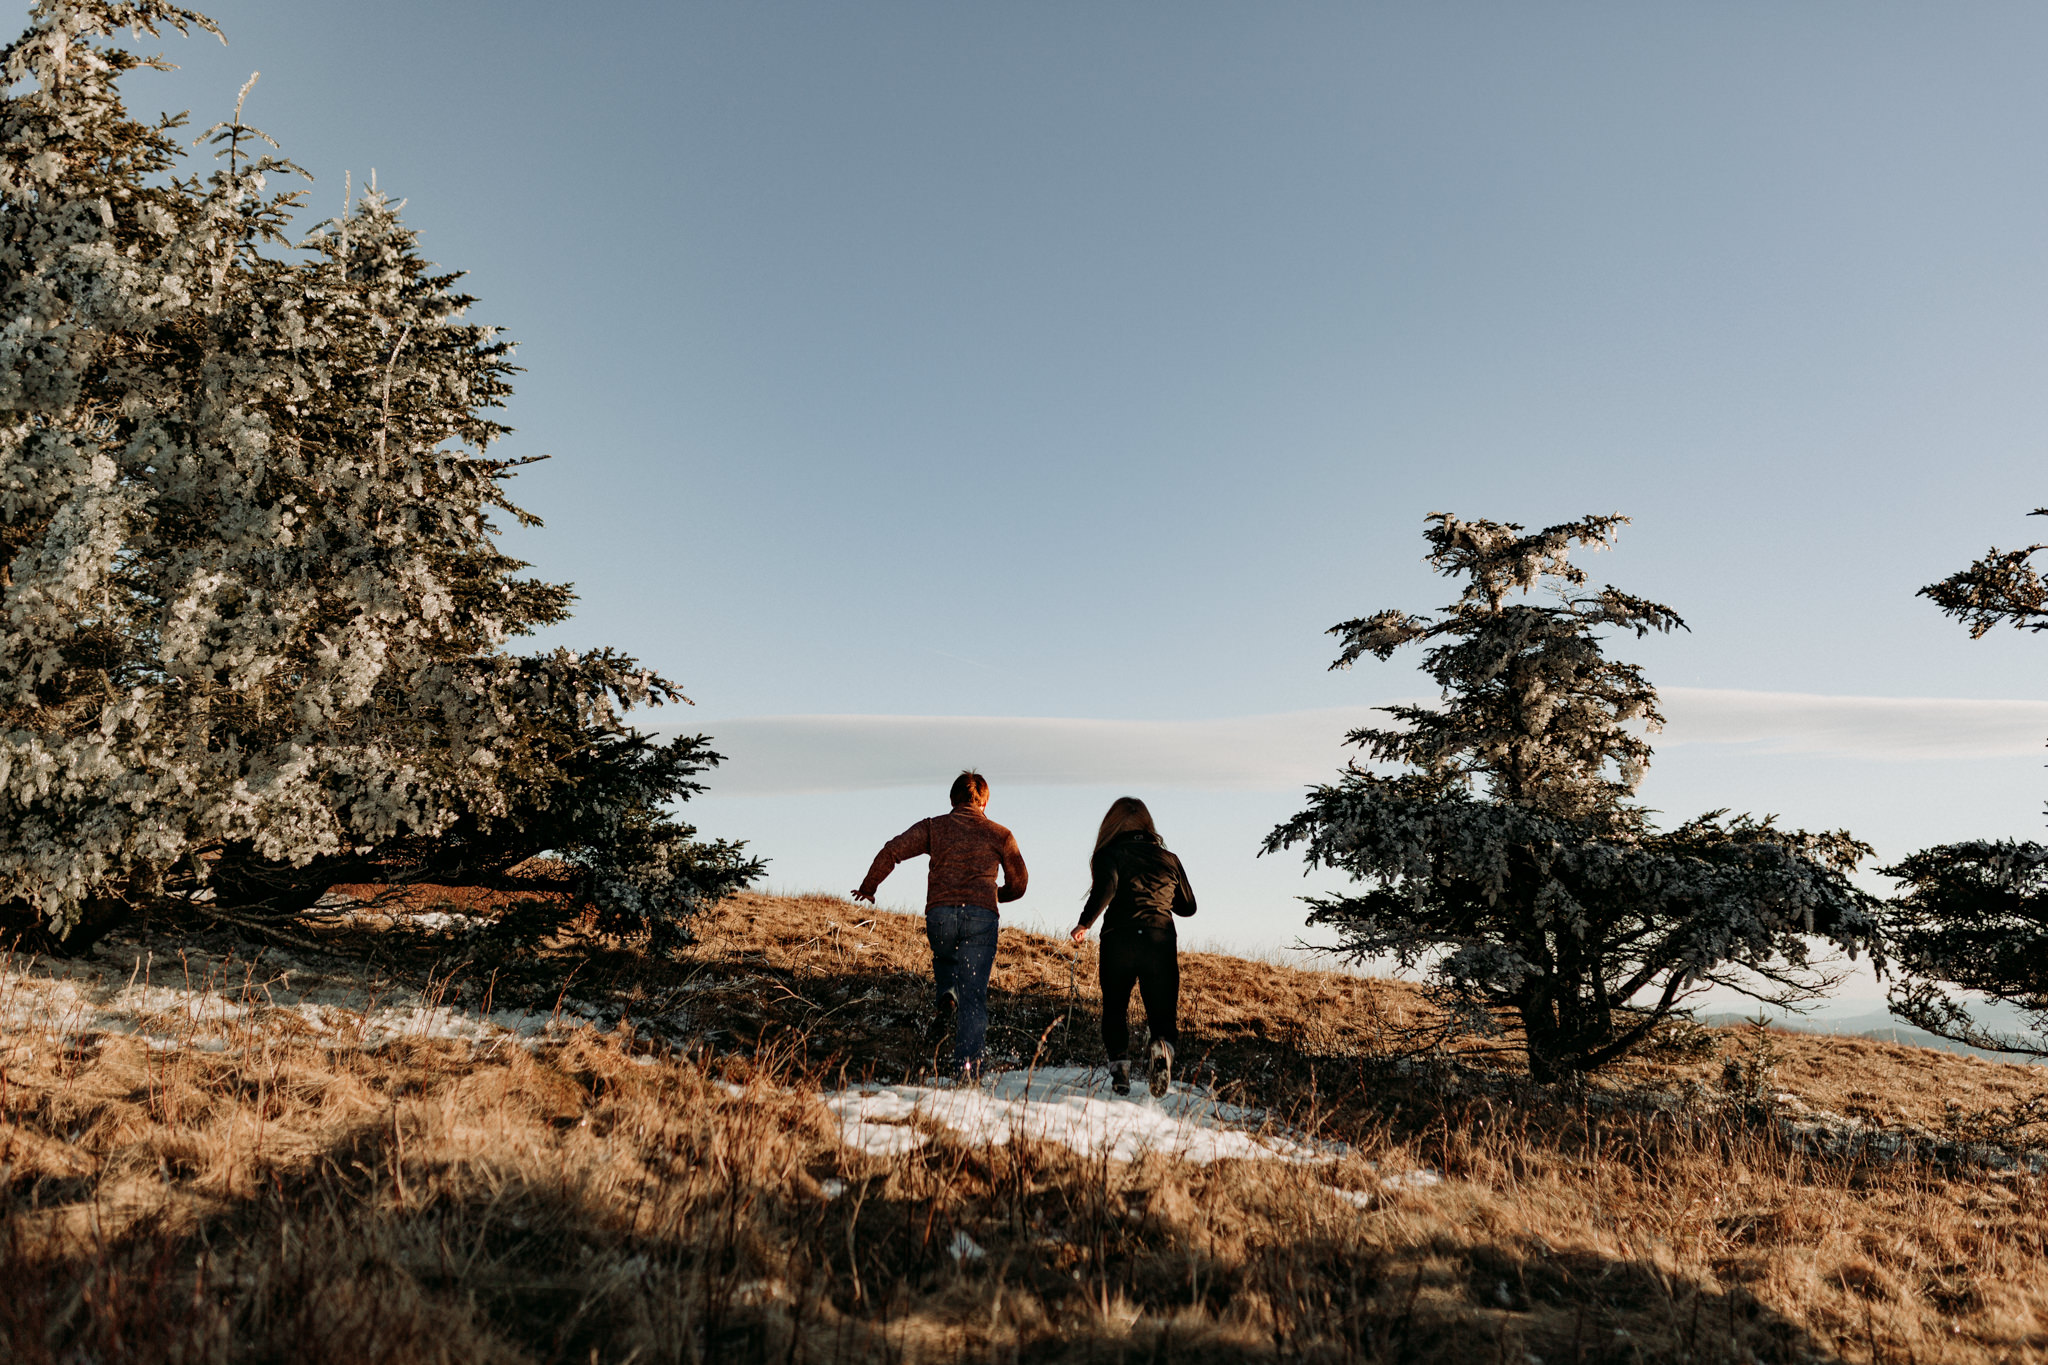 MonicaLeavellPhoto-AshleyMitch-NorthCarolina-Adventure-Engagement-Photographer-28.jpg